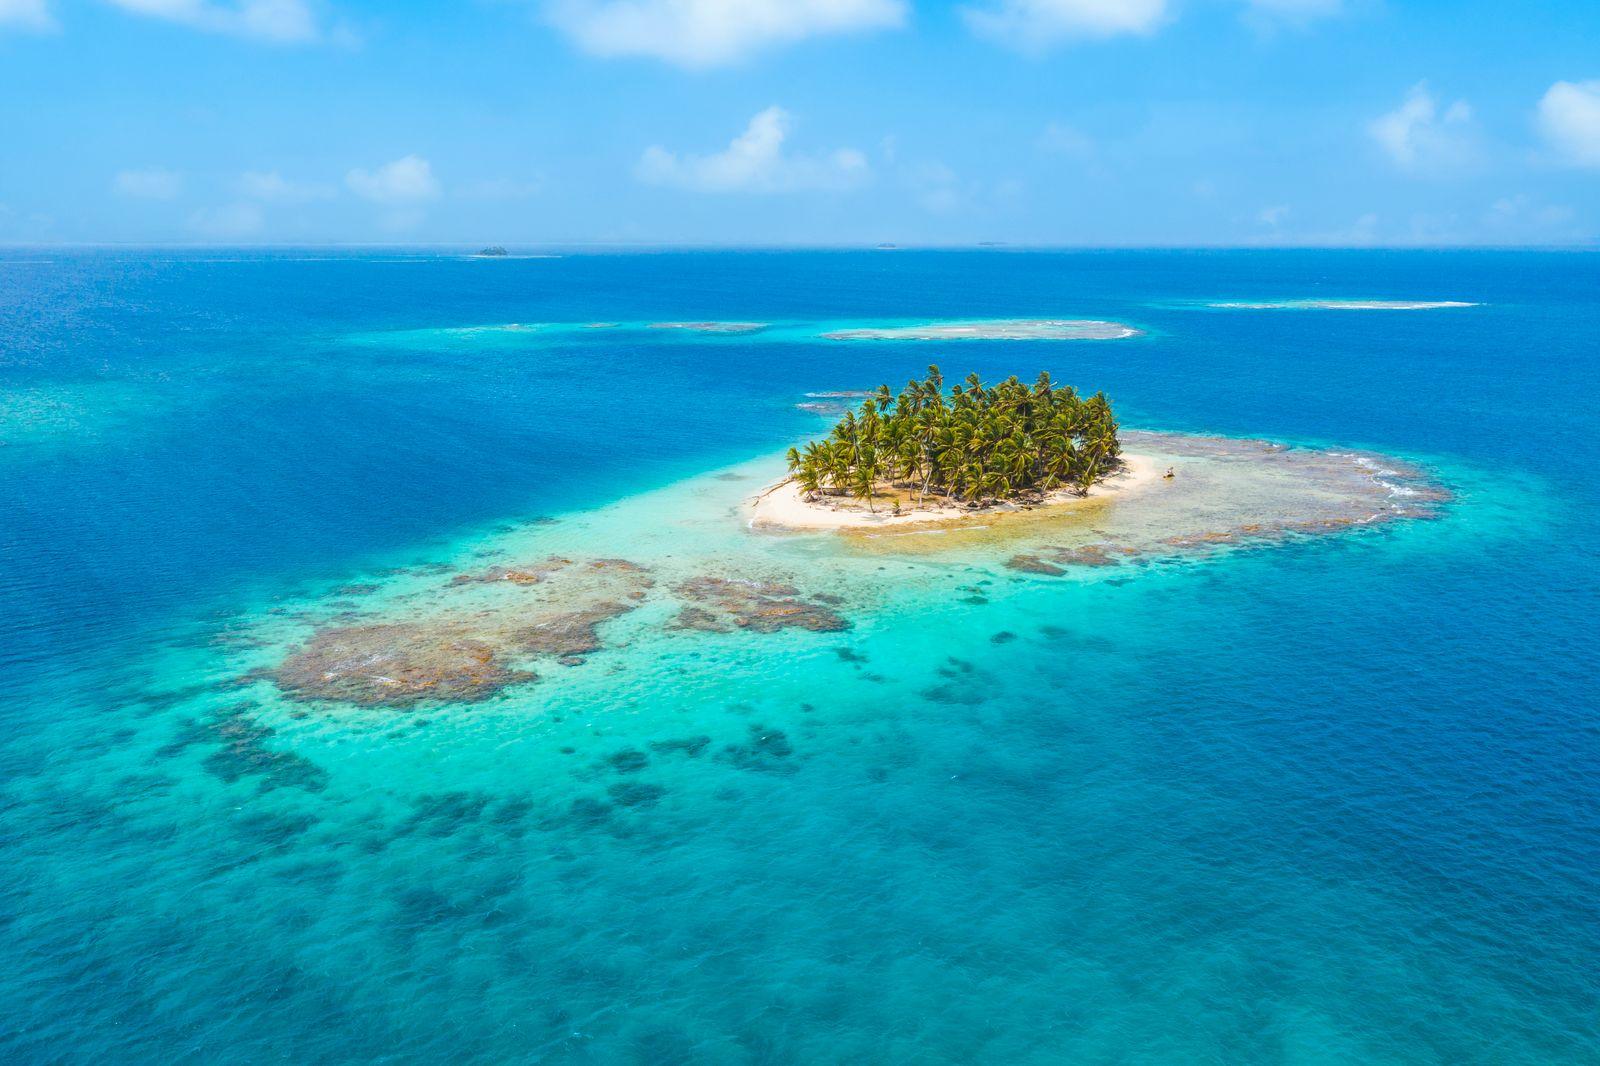 Aerial view of a tropical island, San Blas, Panama.